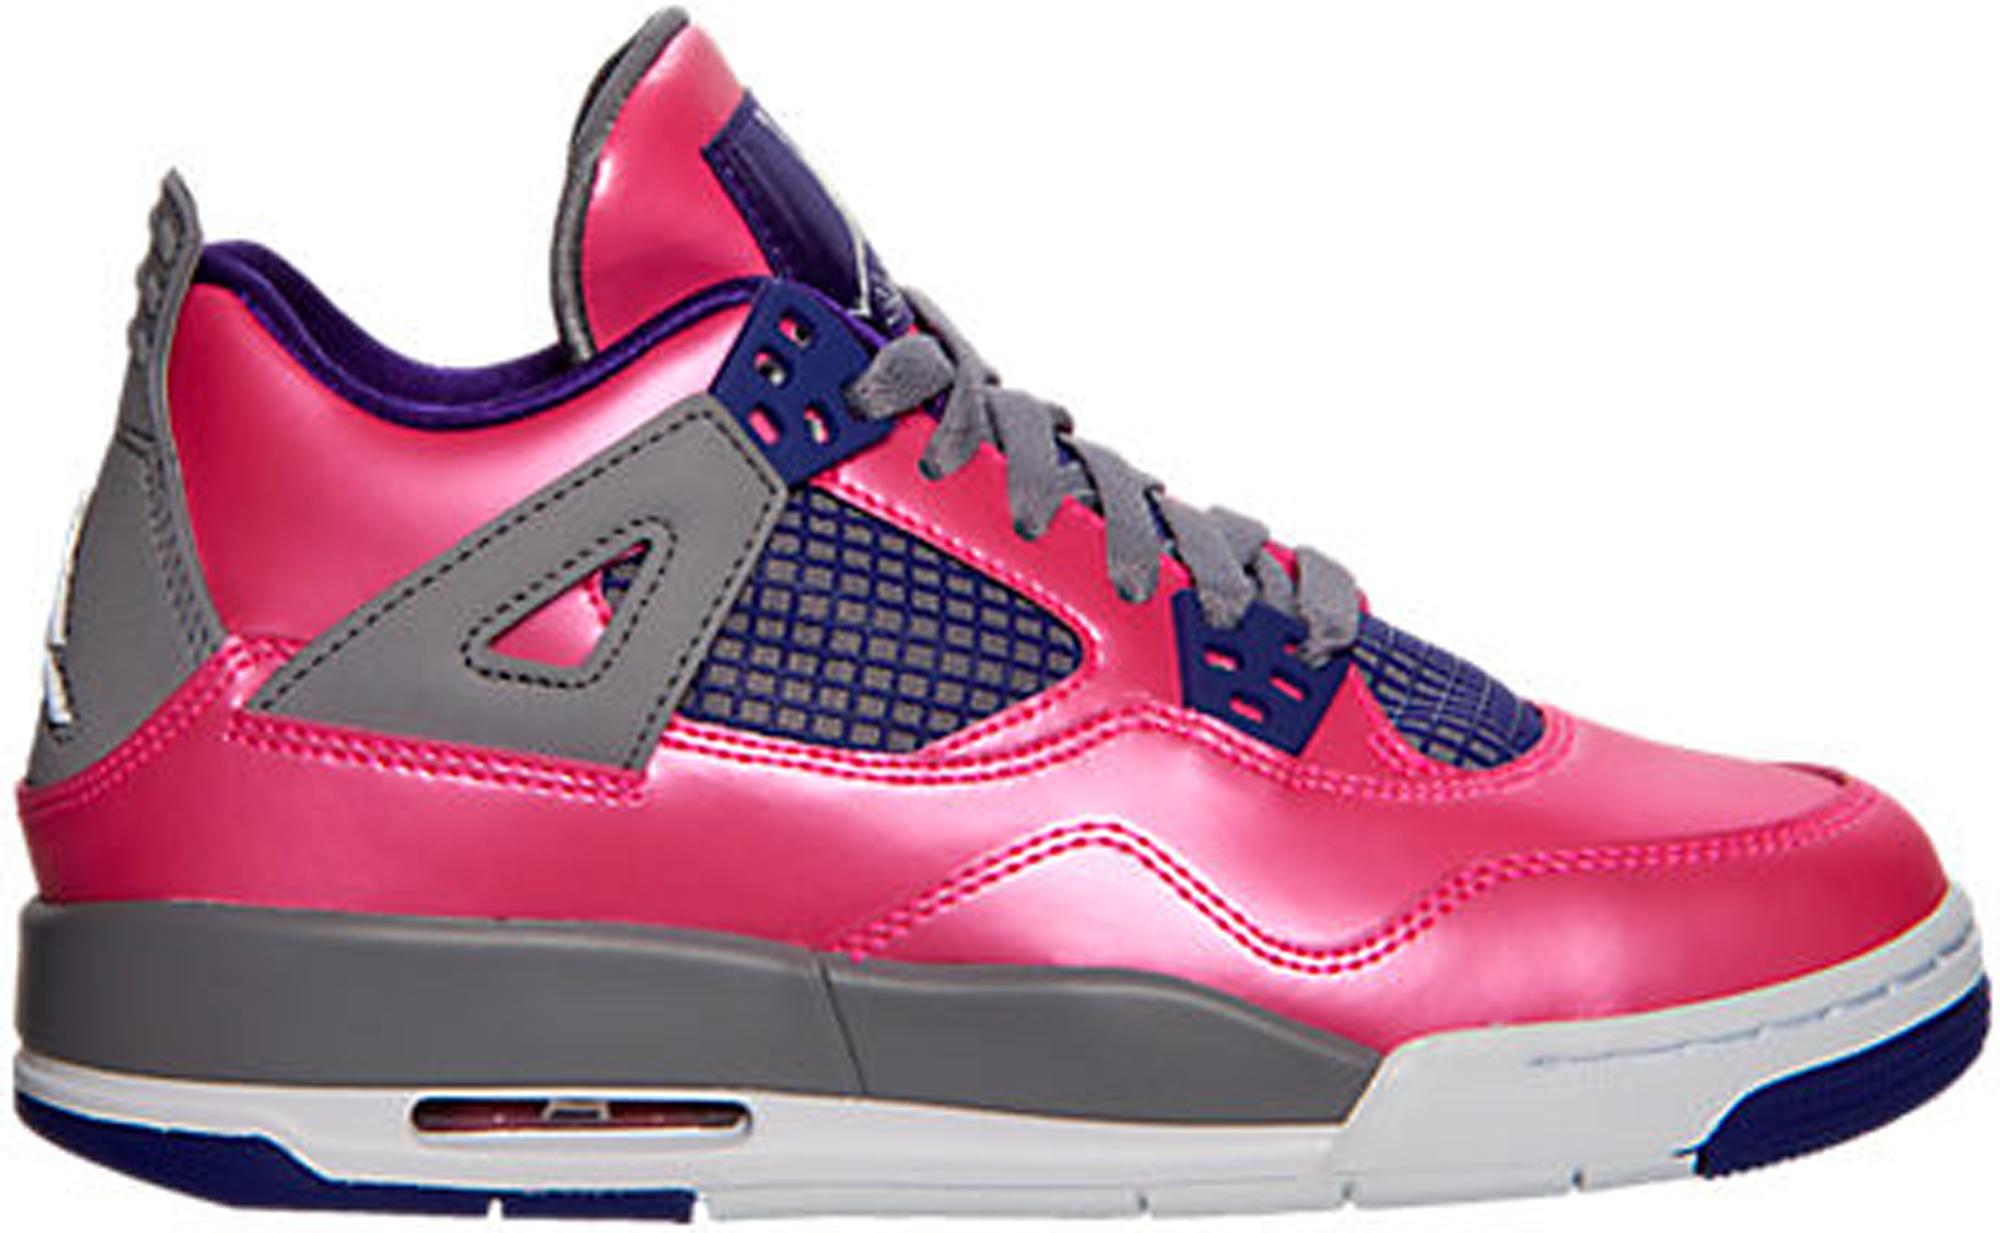 Jordan 4 Retro Pink Foil (GS) - 487724-607